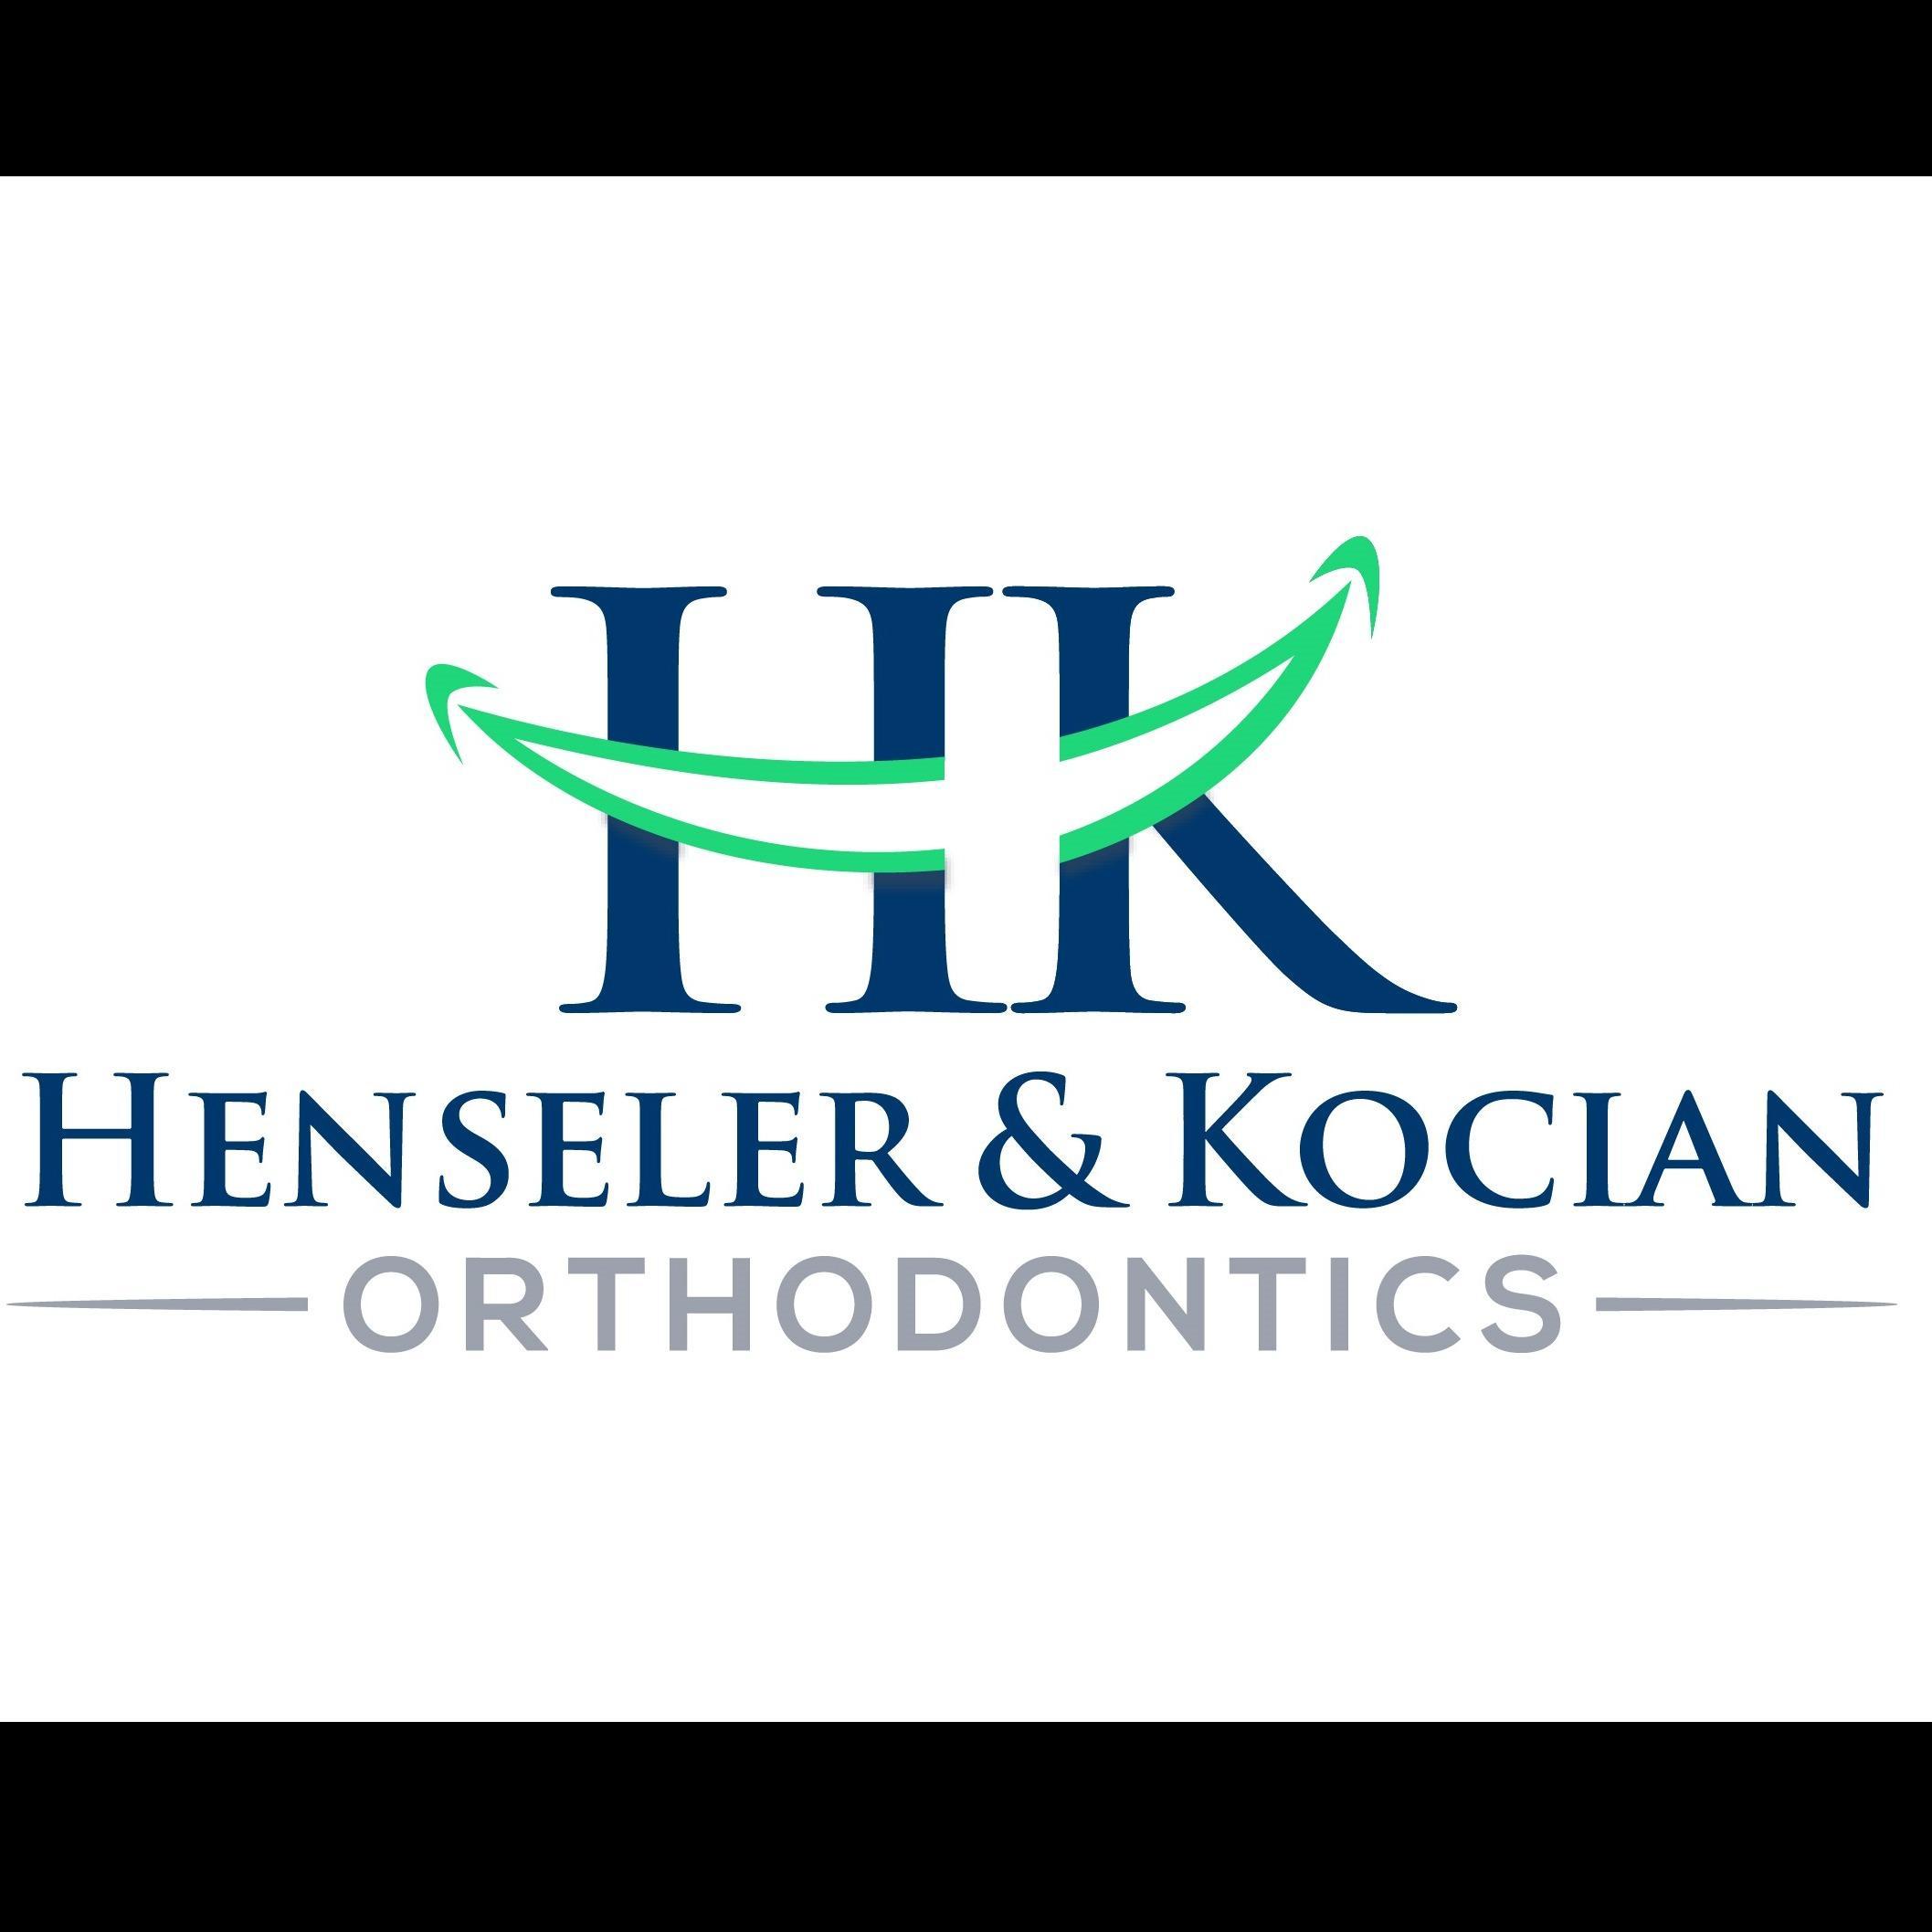 Henseler & Kocian Orthodontics - Woodbury, MN - Dentists & Dental Services